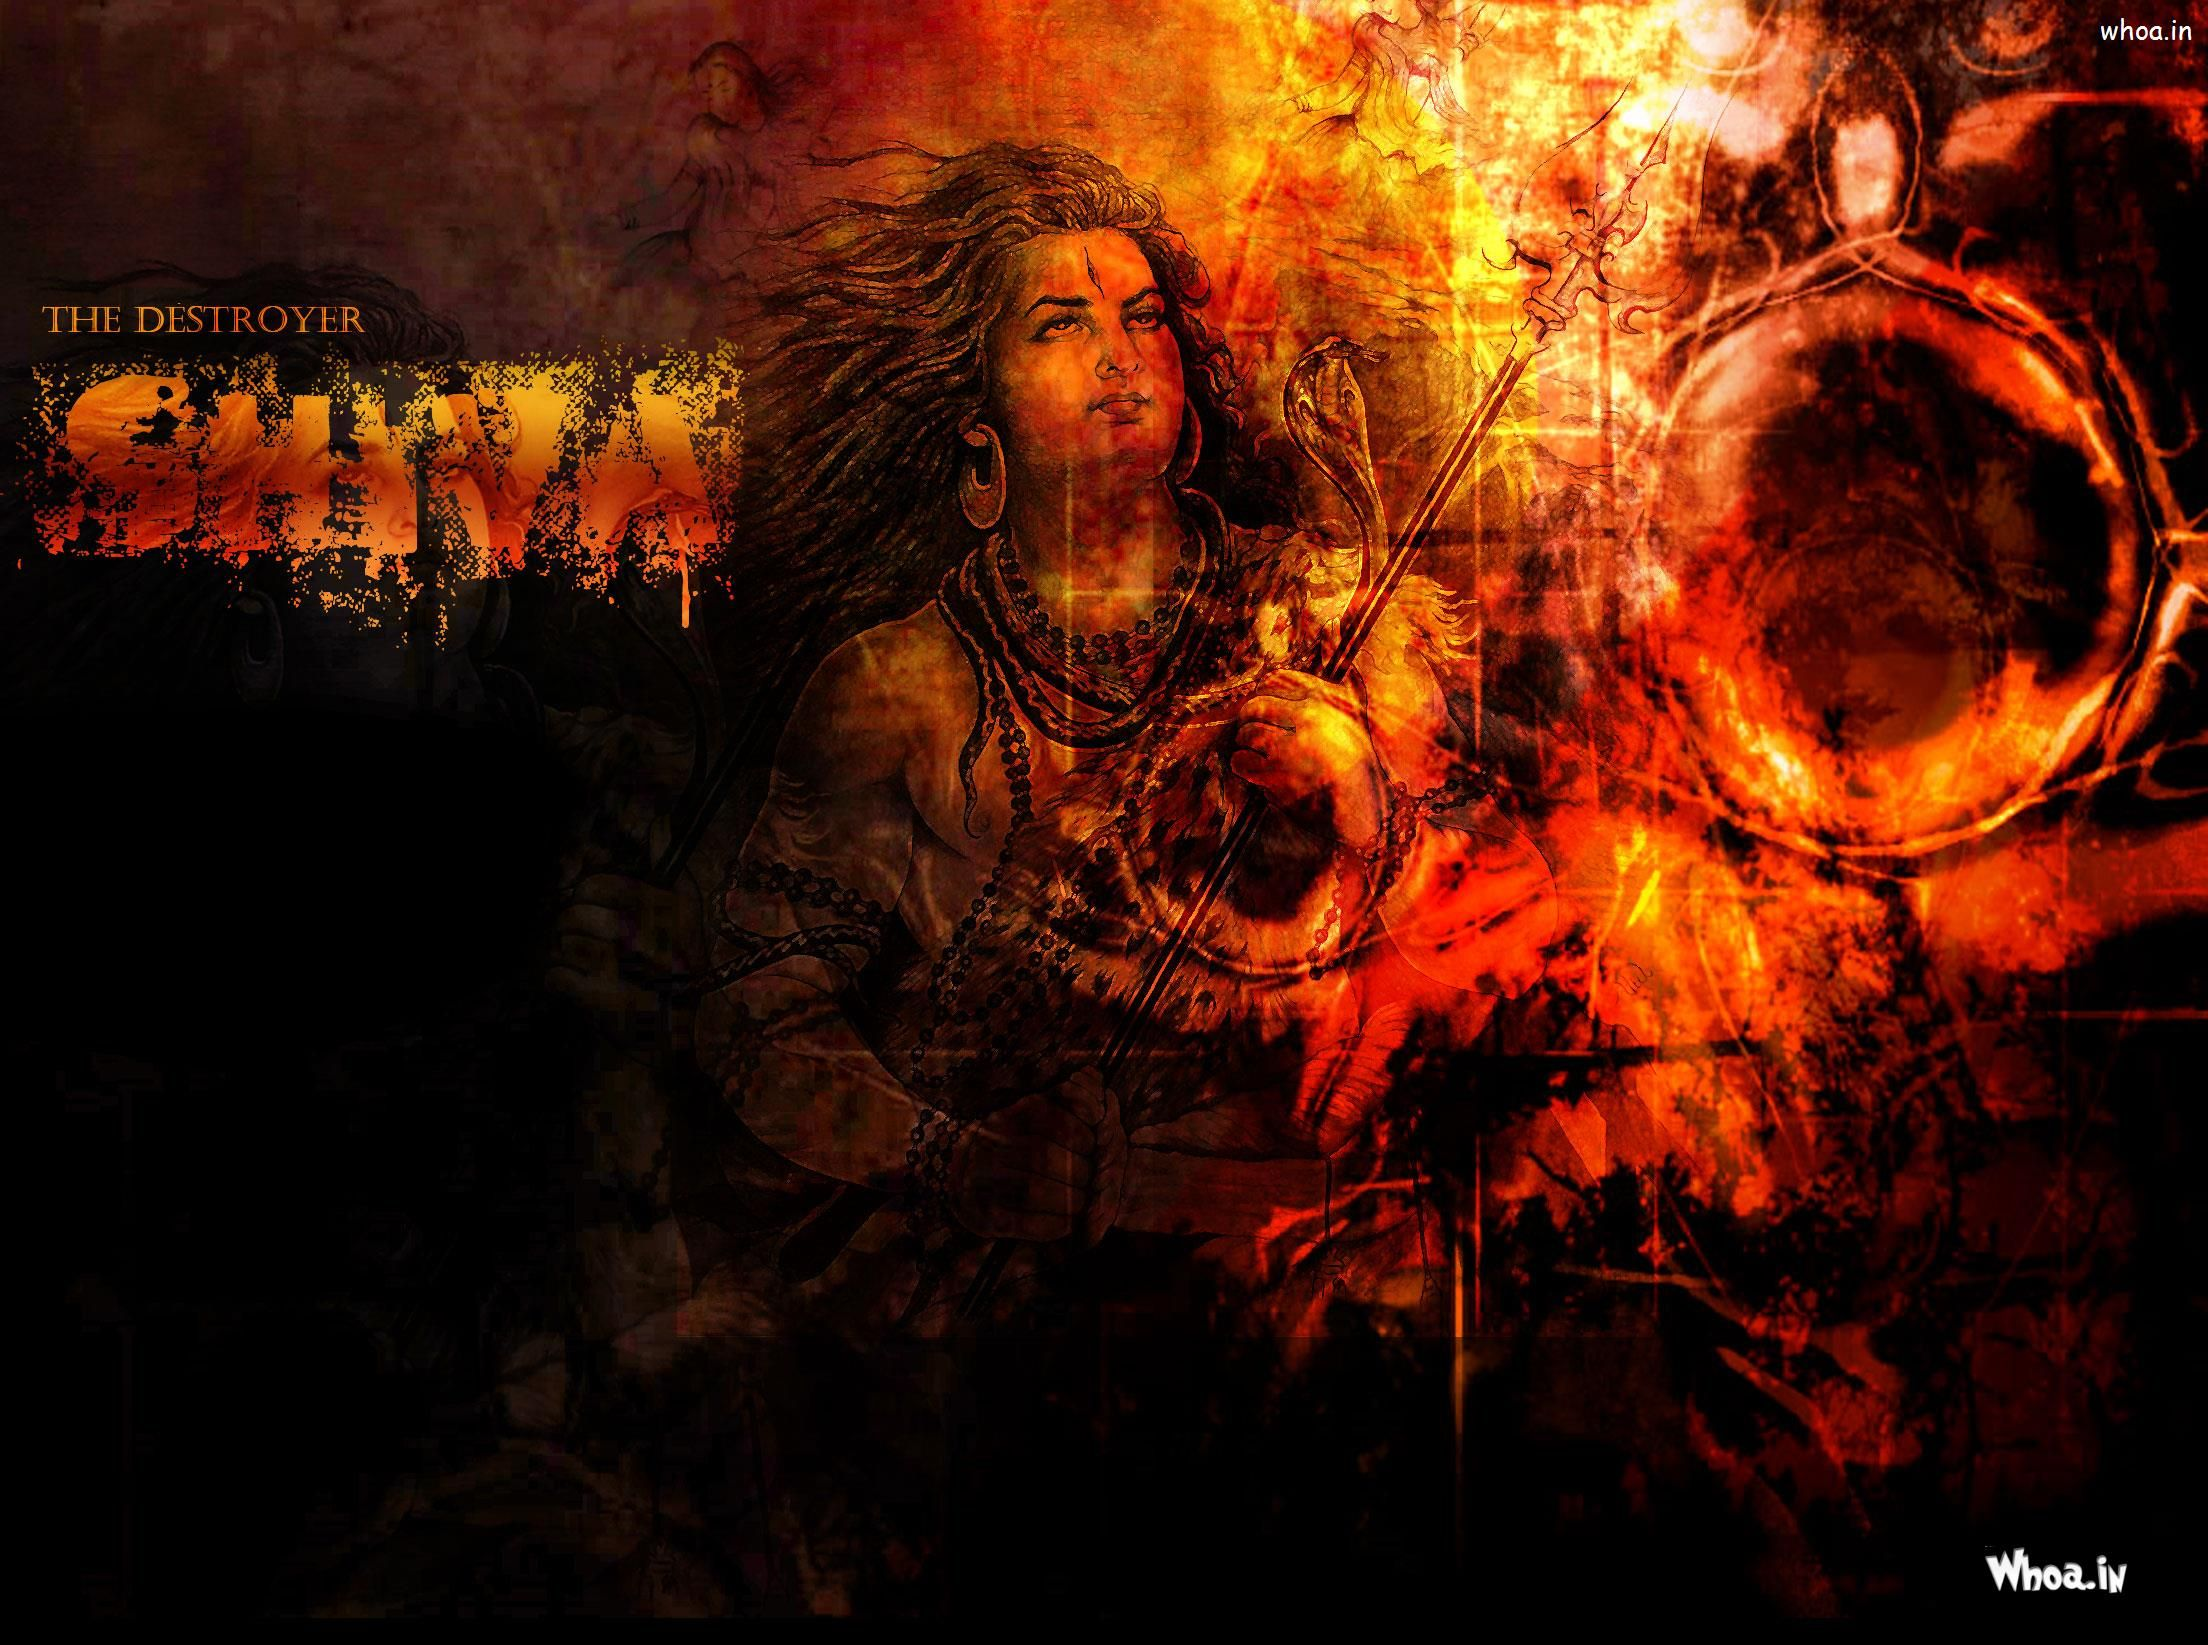 Download Shiva Animated Wallpaper Hd Gallery: The Destroyer Shiva Hd Wallpaper For Free Download